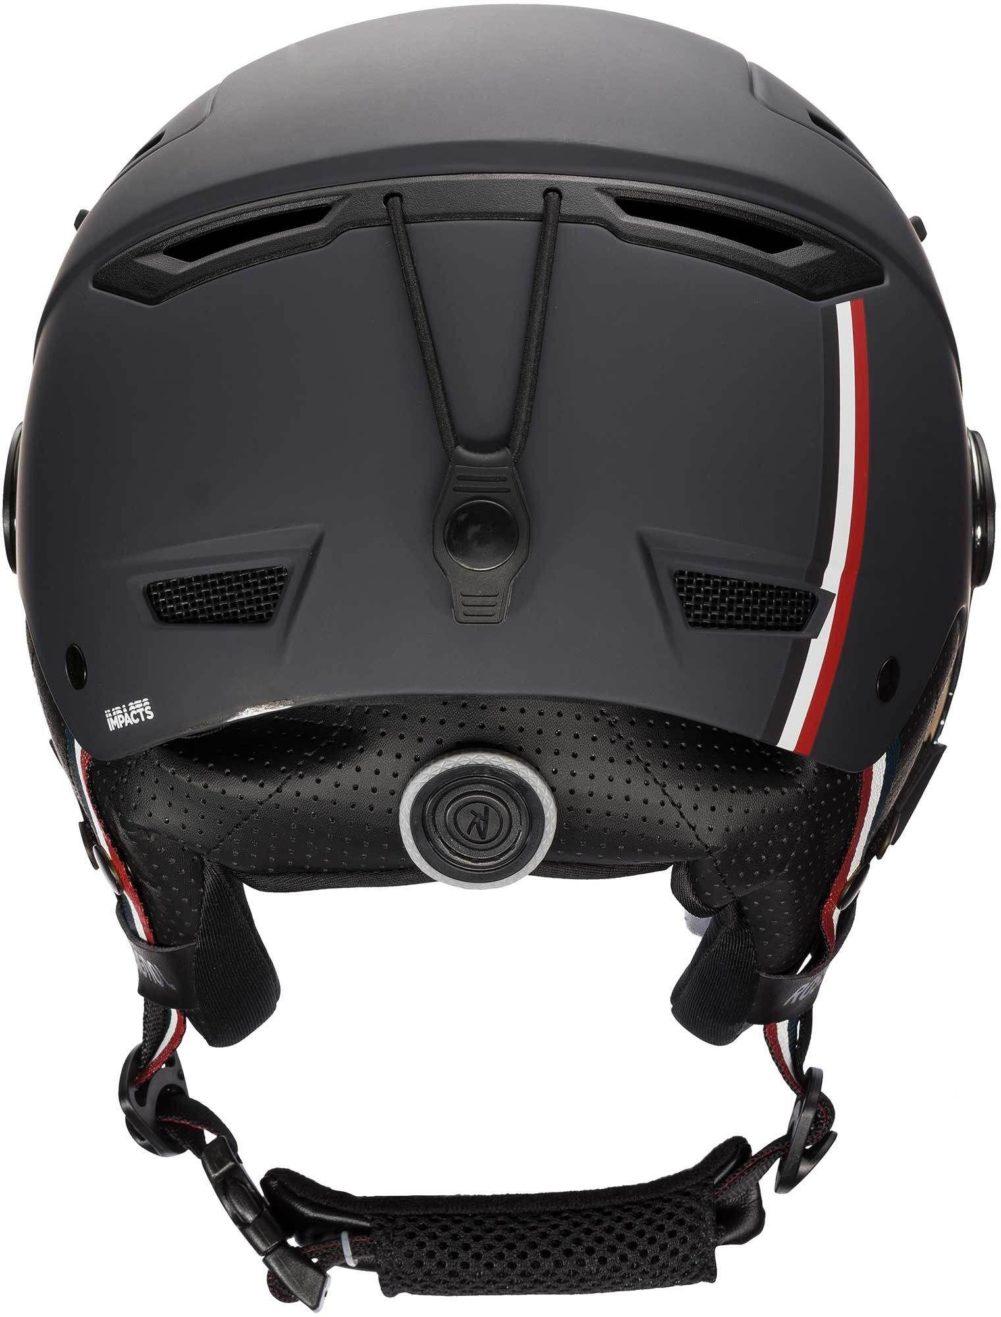 Rossignol Allspeed Visor Impacts Strato Snowsports Helmet